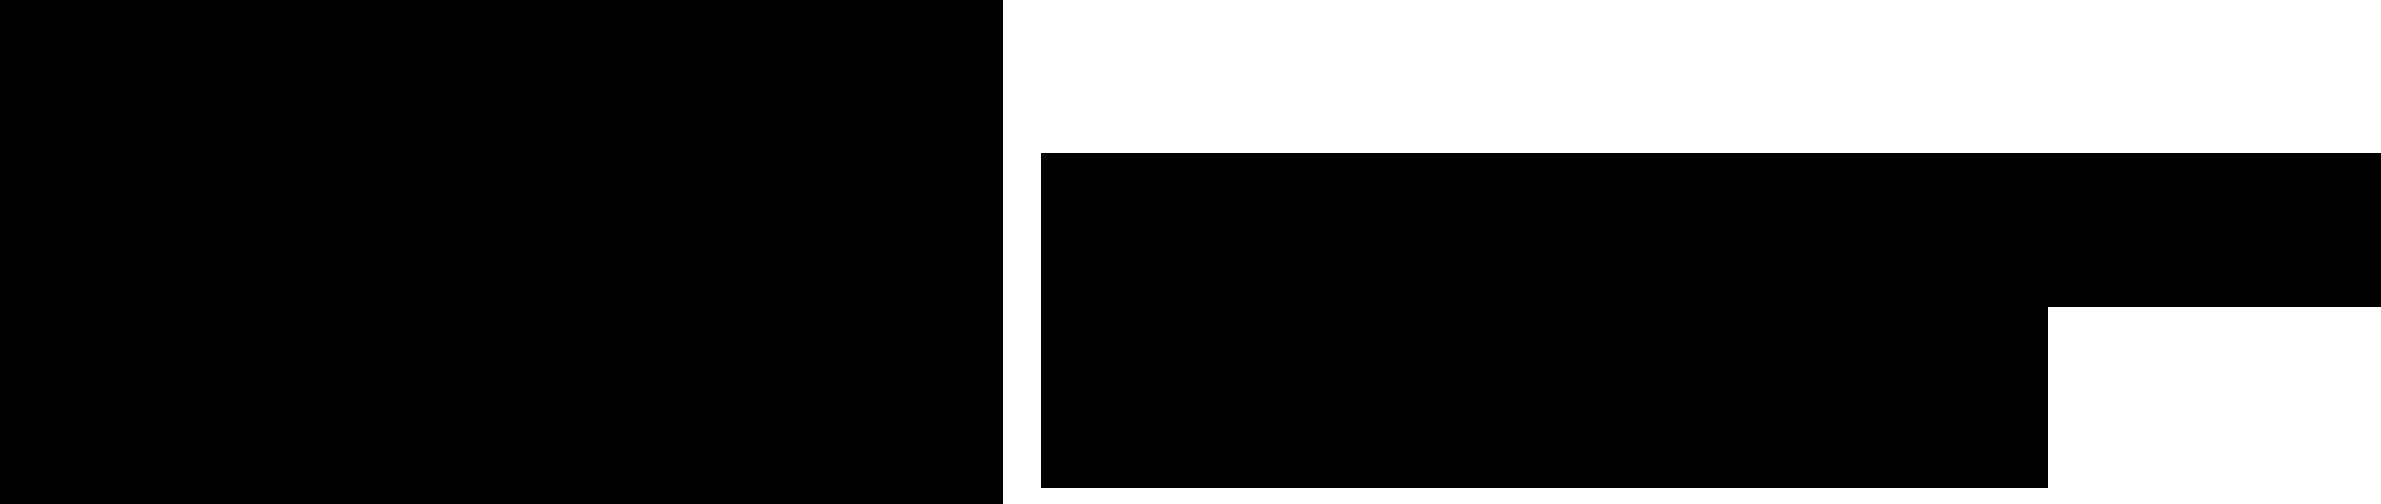 DIVERGENCE ACADEMY LOGO (BLACK)